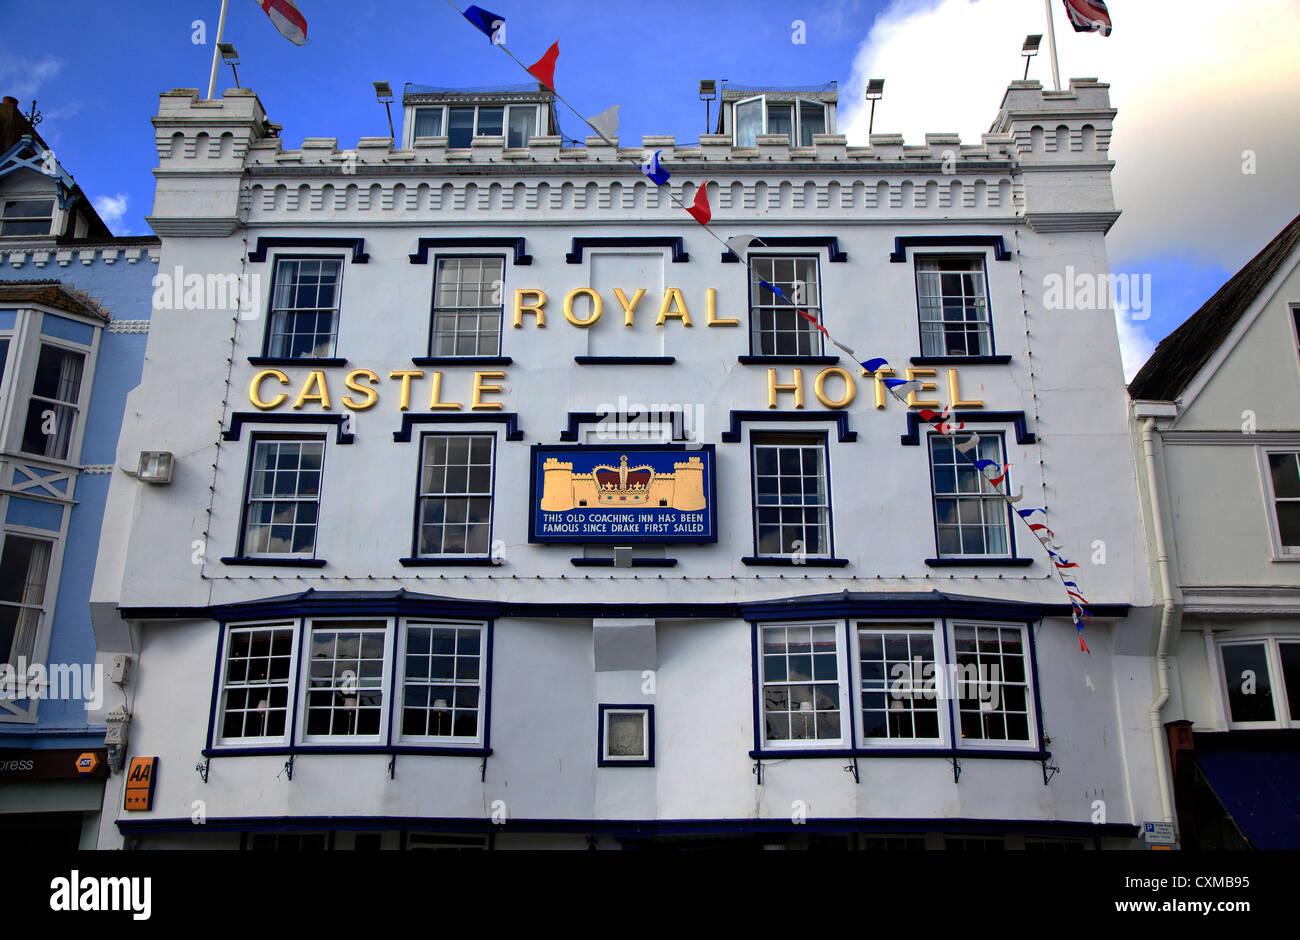 Royal Castle Hotel Dartmouth Devon England. Stock Photo